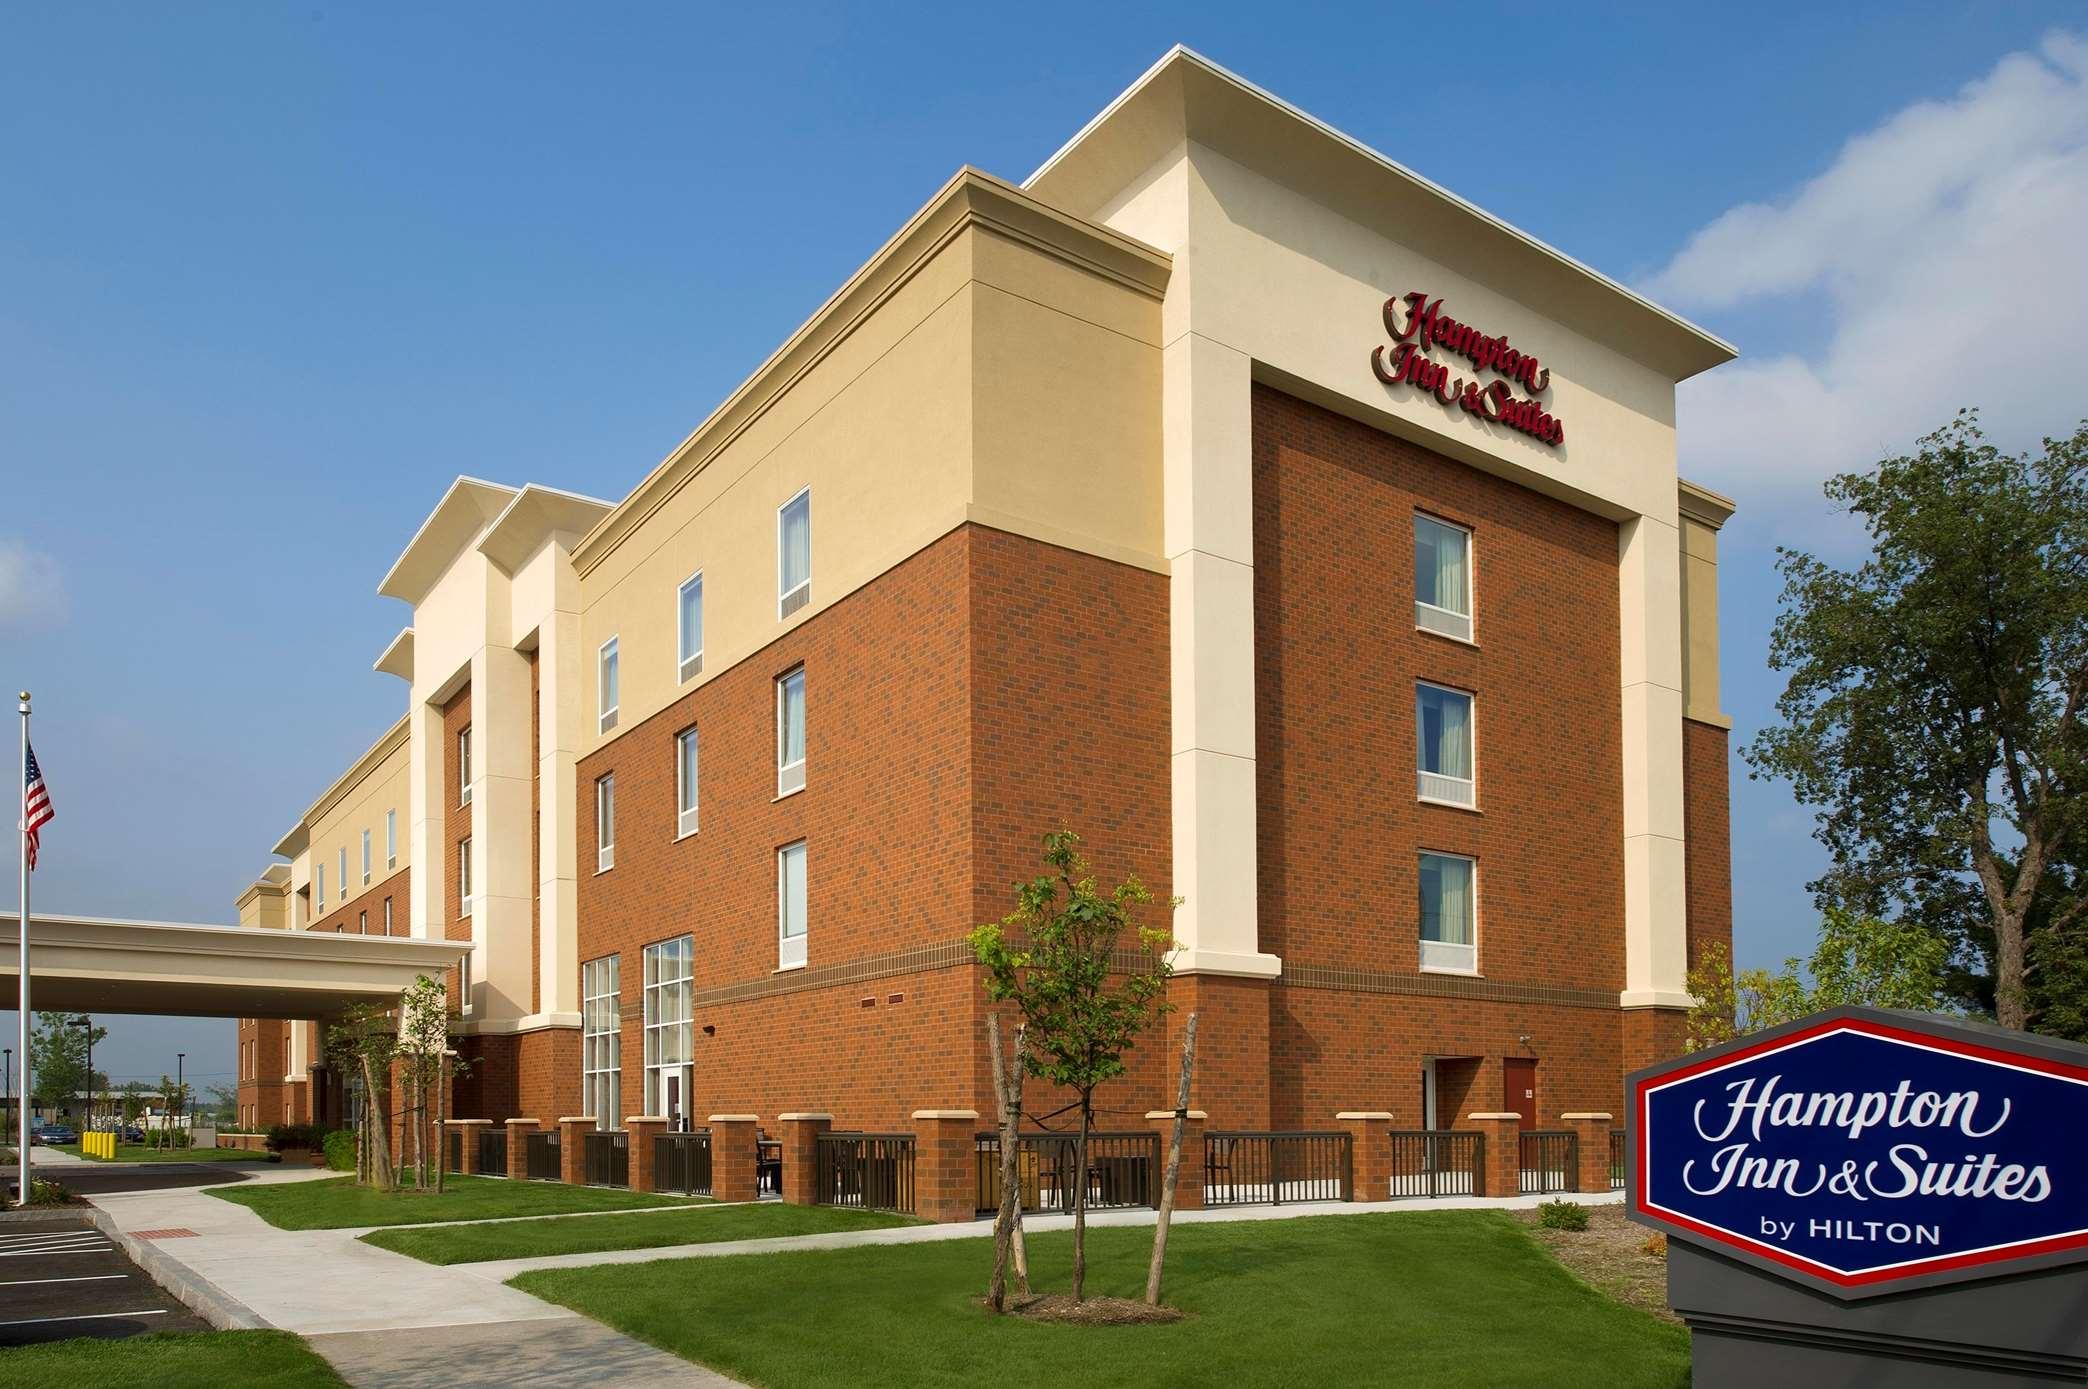 Hampton Inn & Suites Syracuse/Carrier Circle image 0